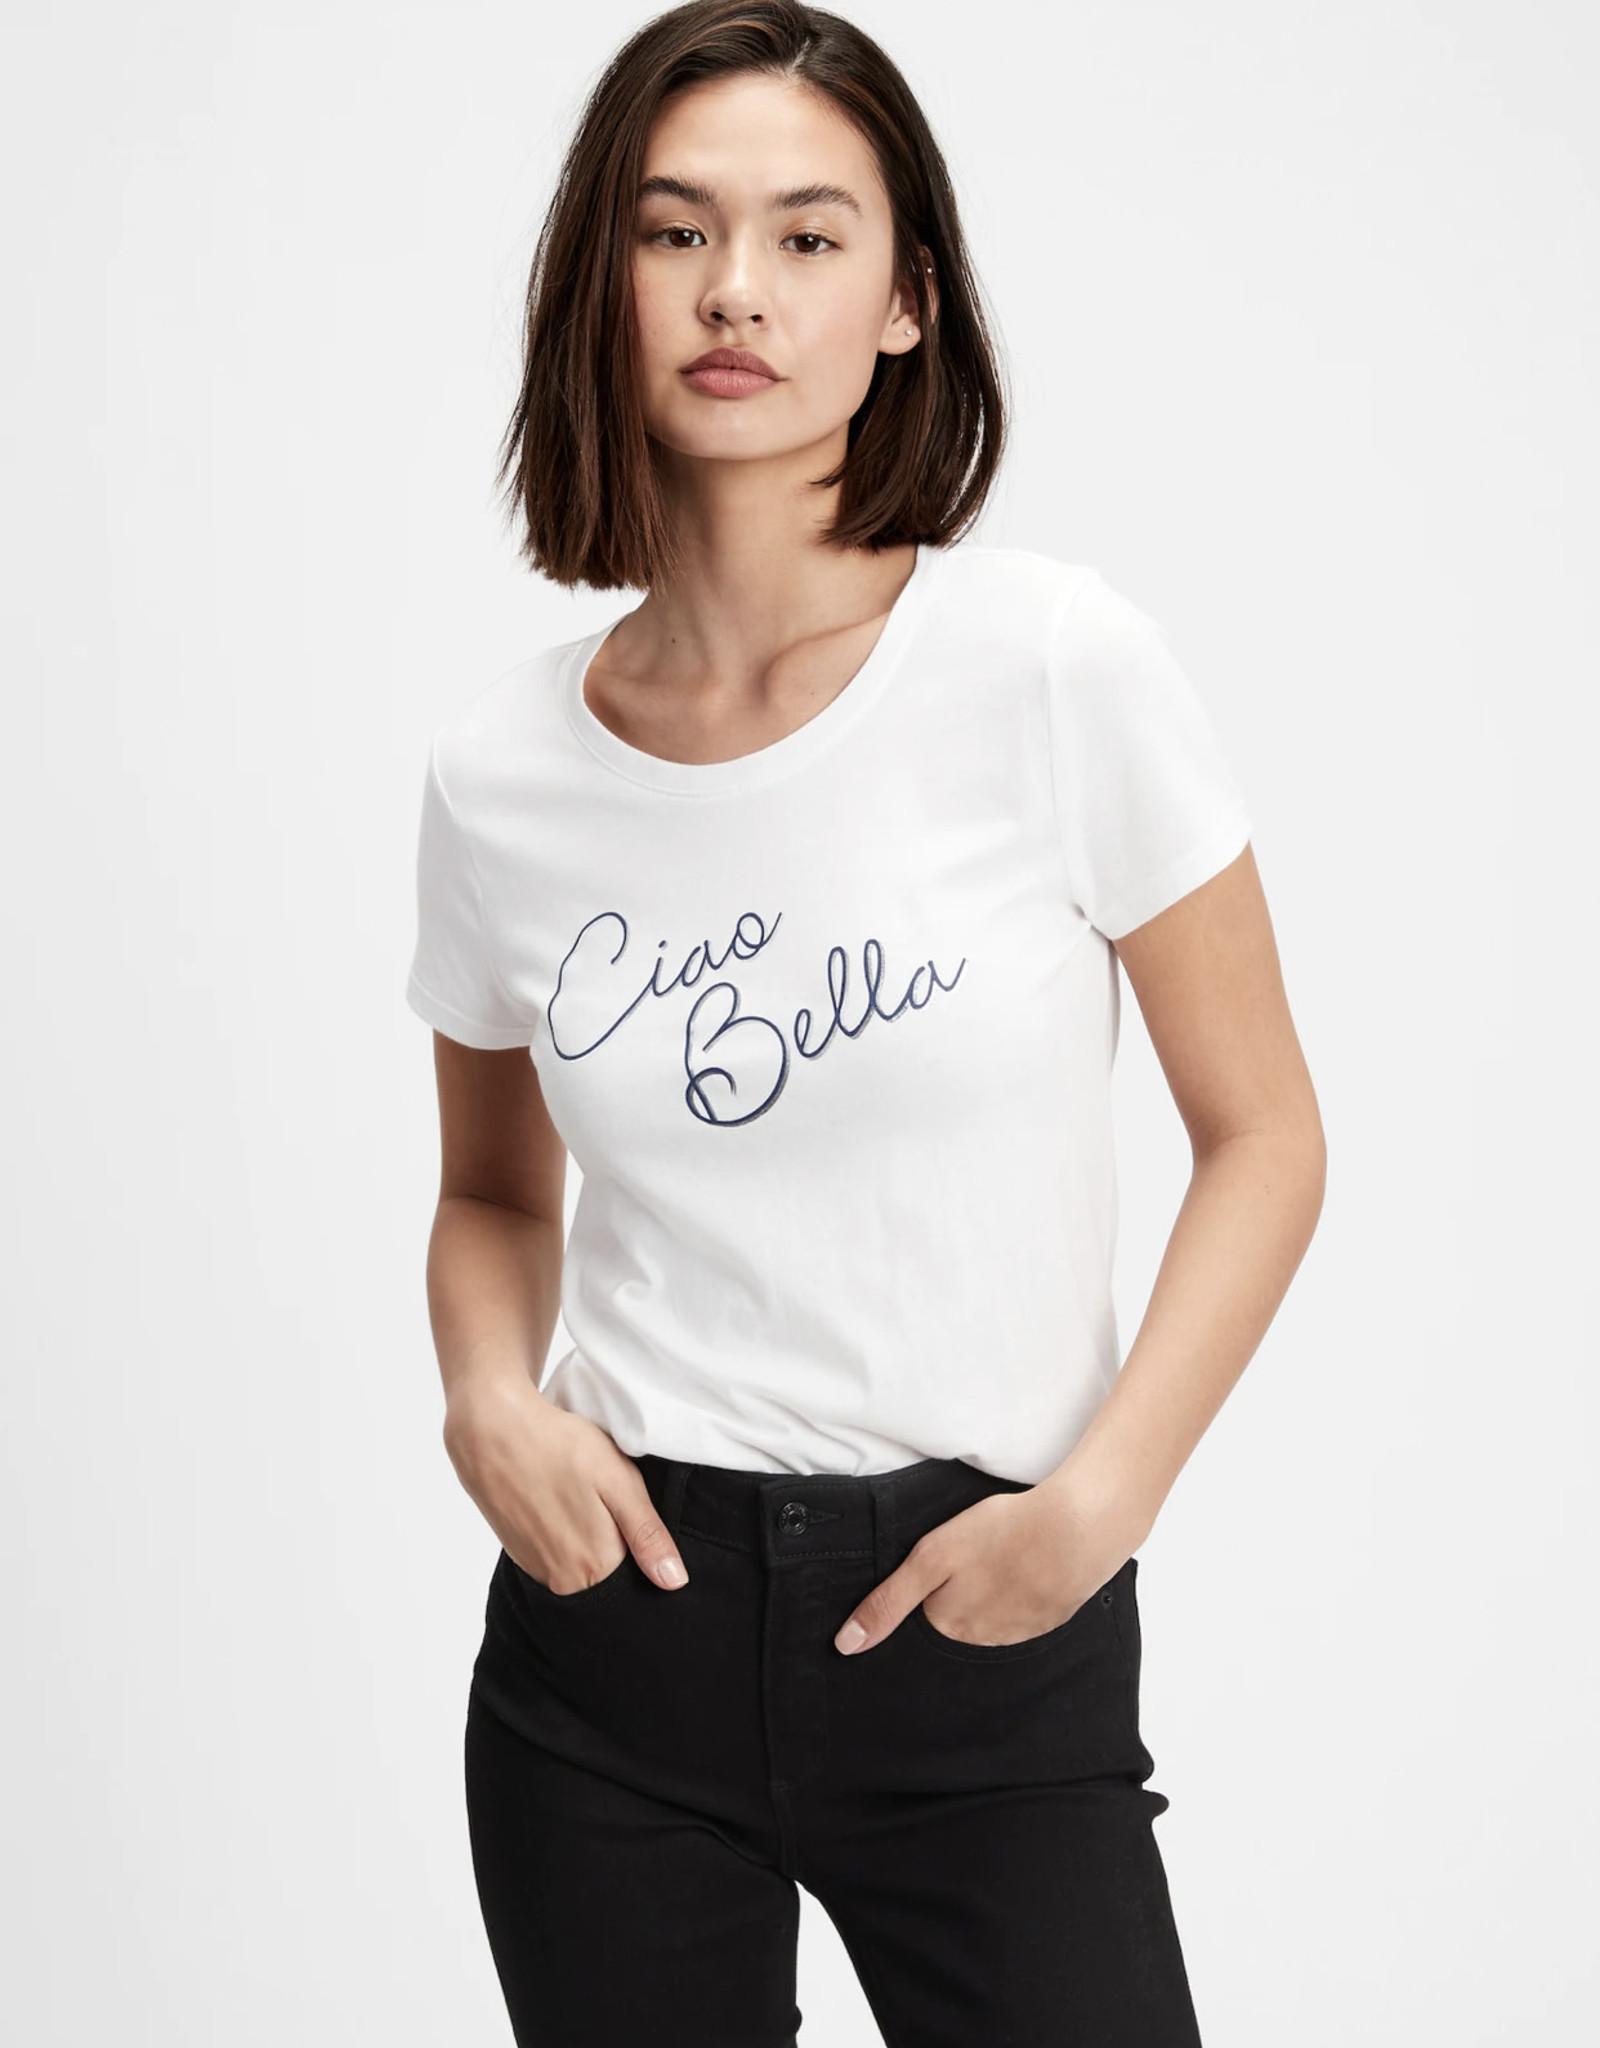 Gap Gap Fav Graphic Shirt Ciao Bella